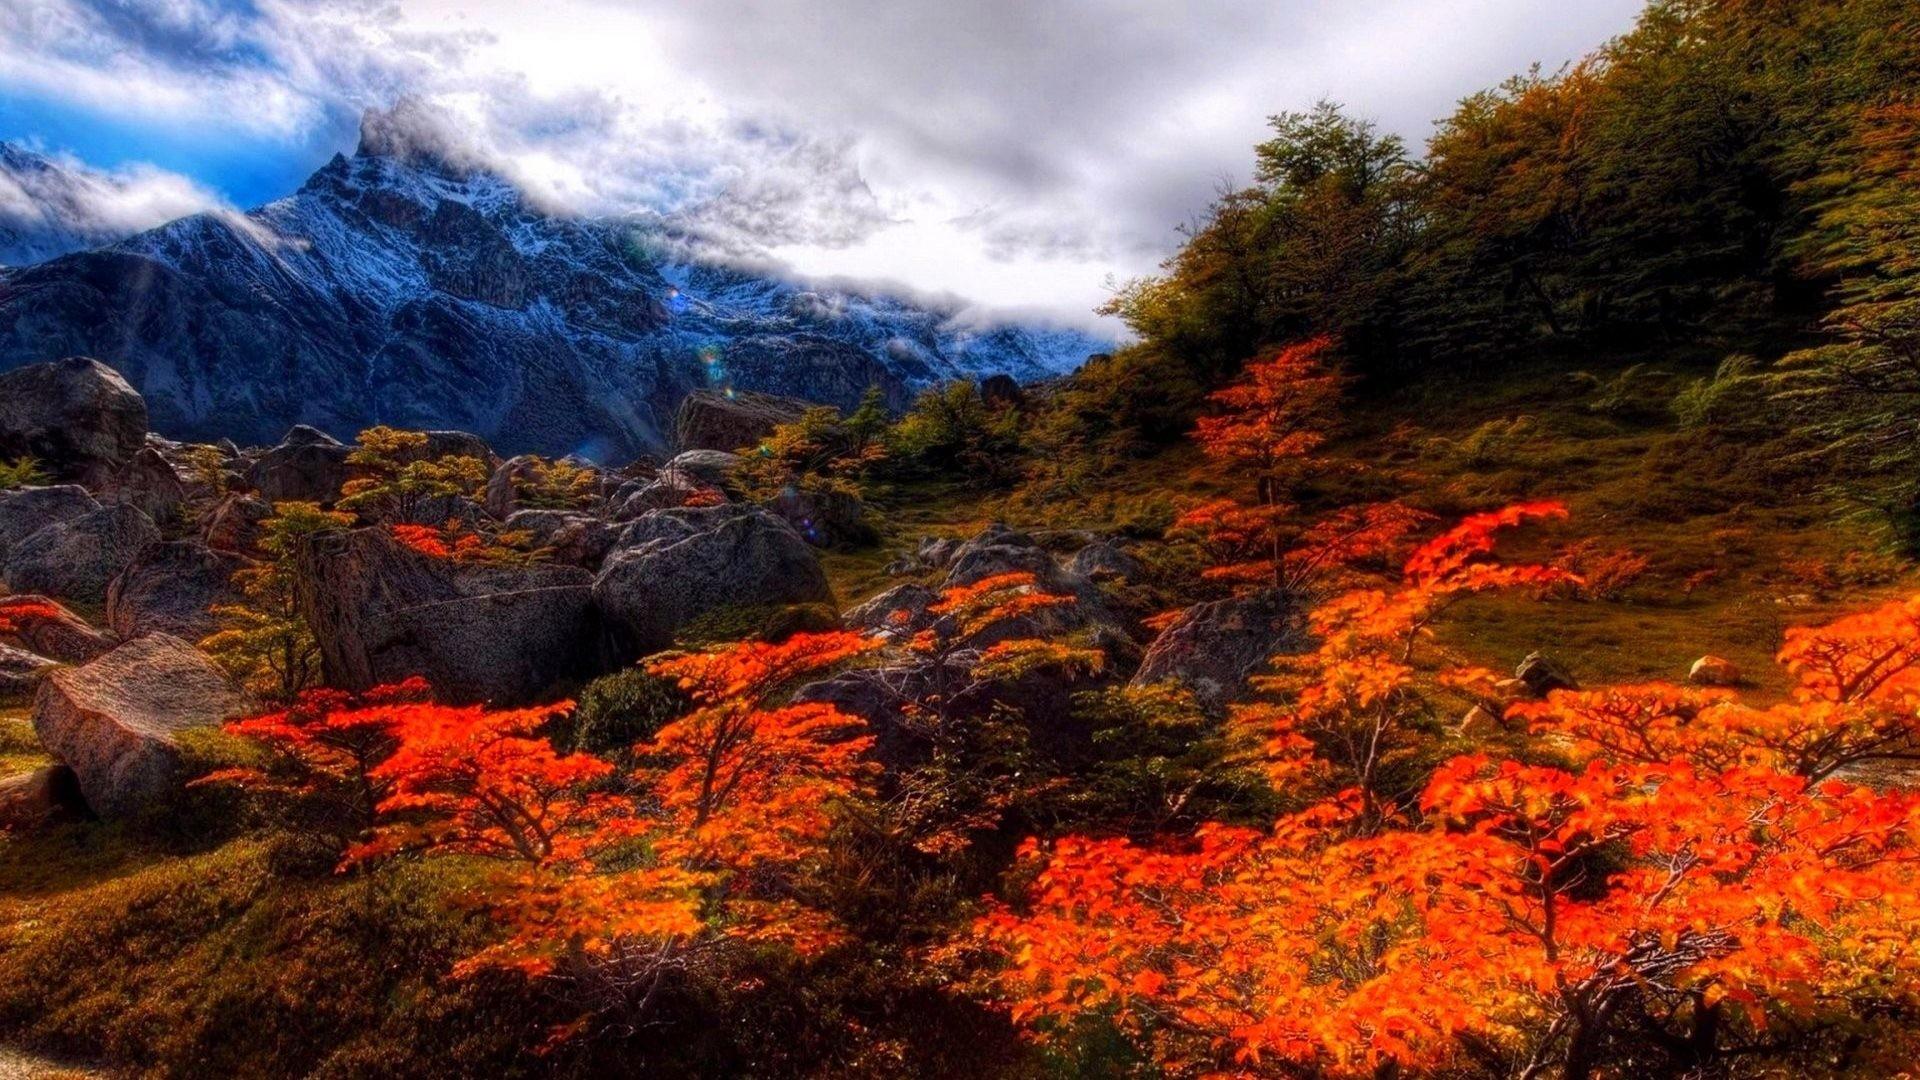 Nature Color Landscape Season Tree Fall Forest Autumn - Fall Forest Desktop Background - HD Wallpaper